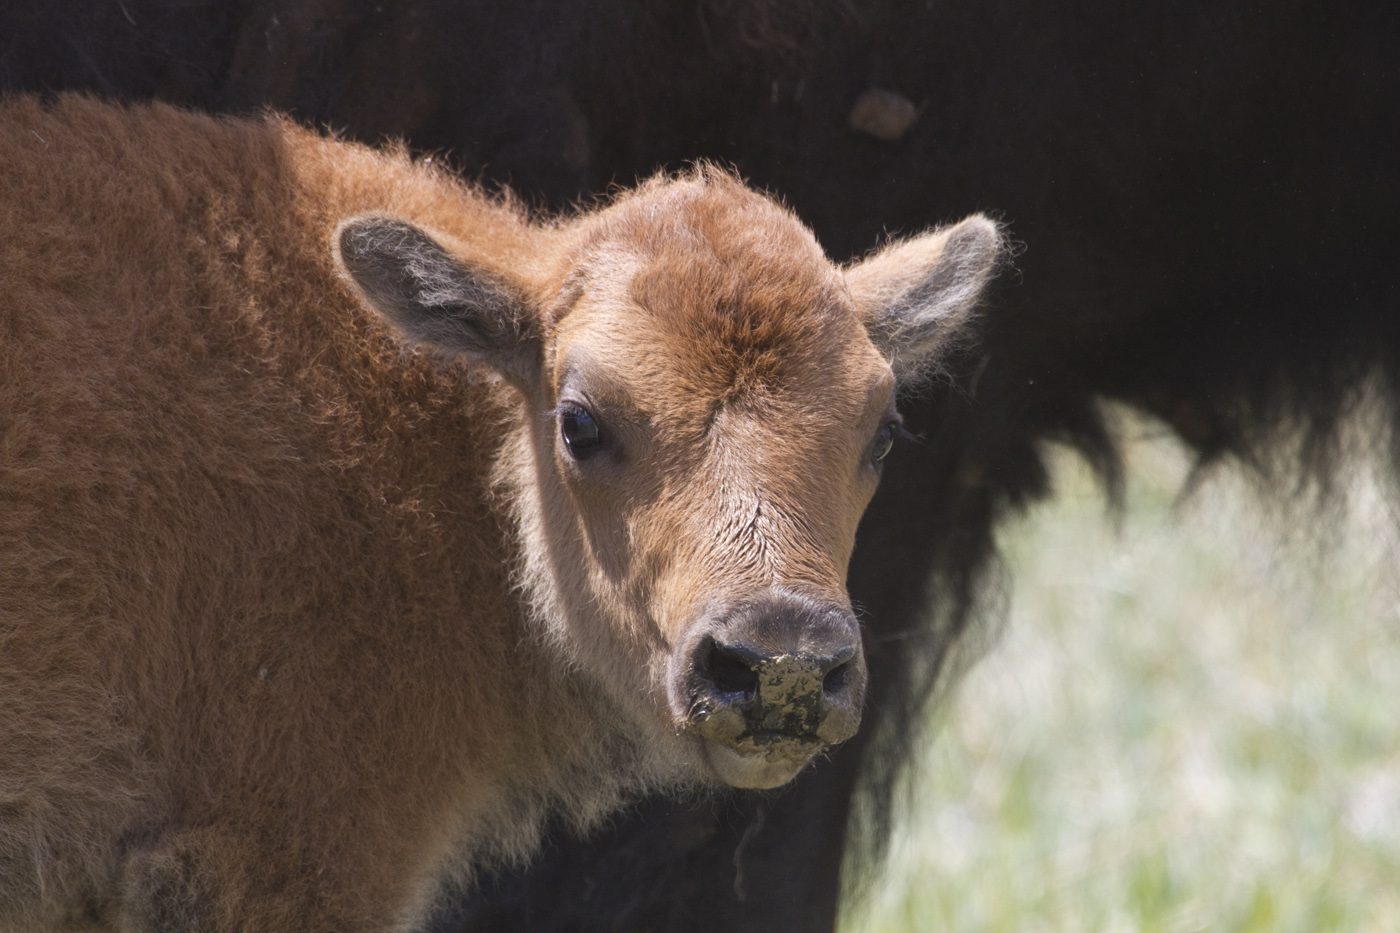 bison | MJ Springett - photo#24